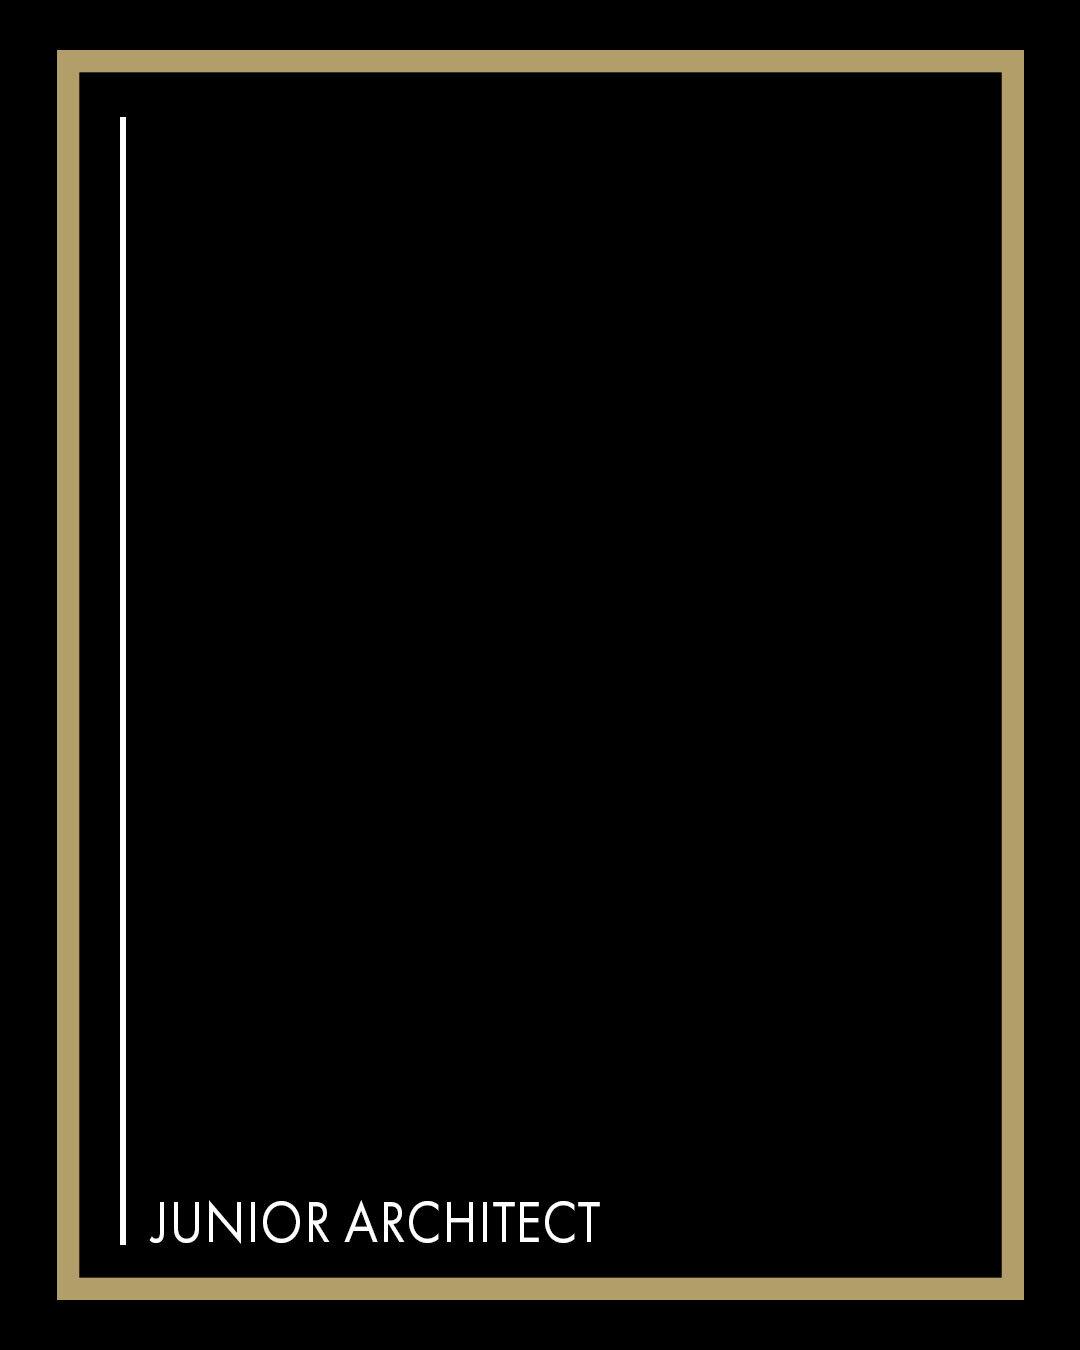 Junior-architect.jpg